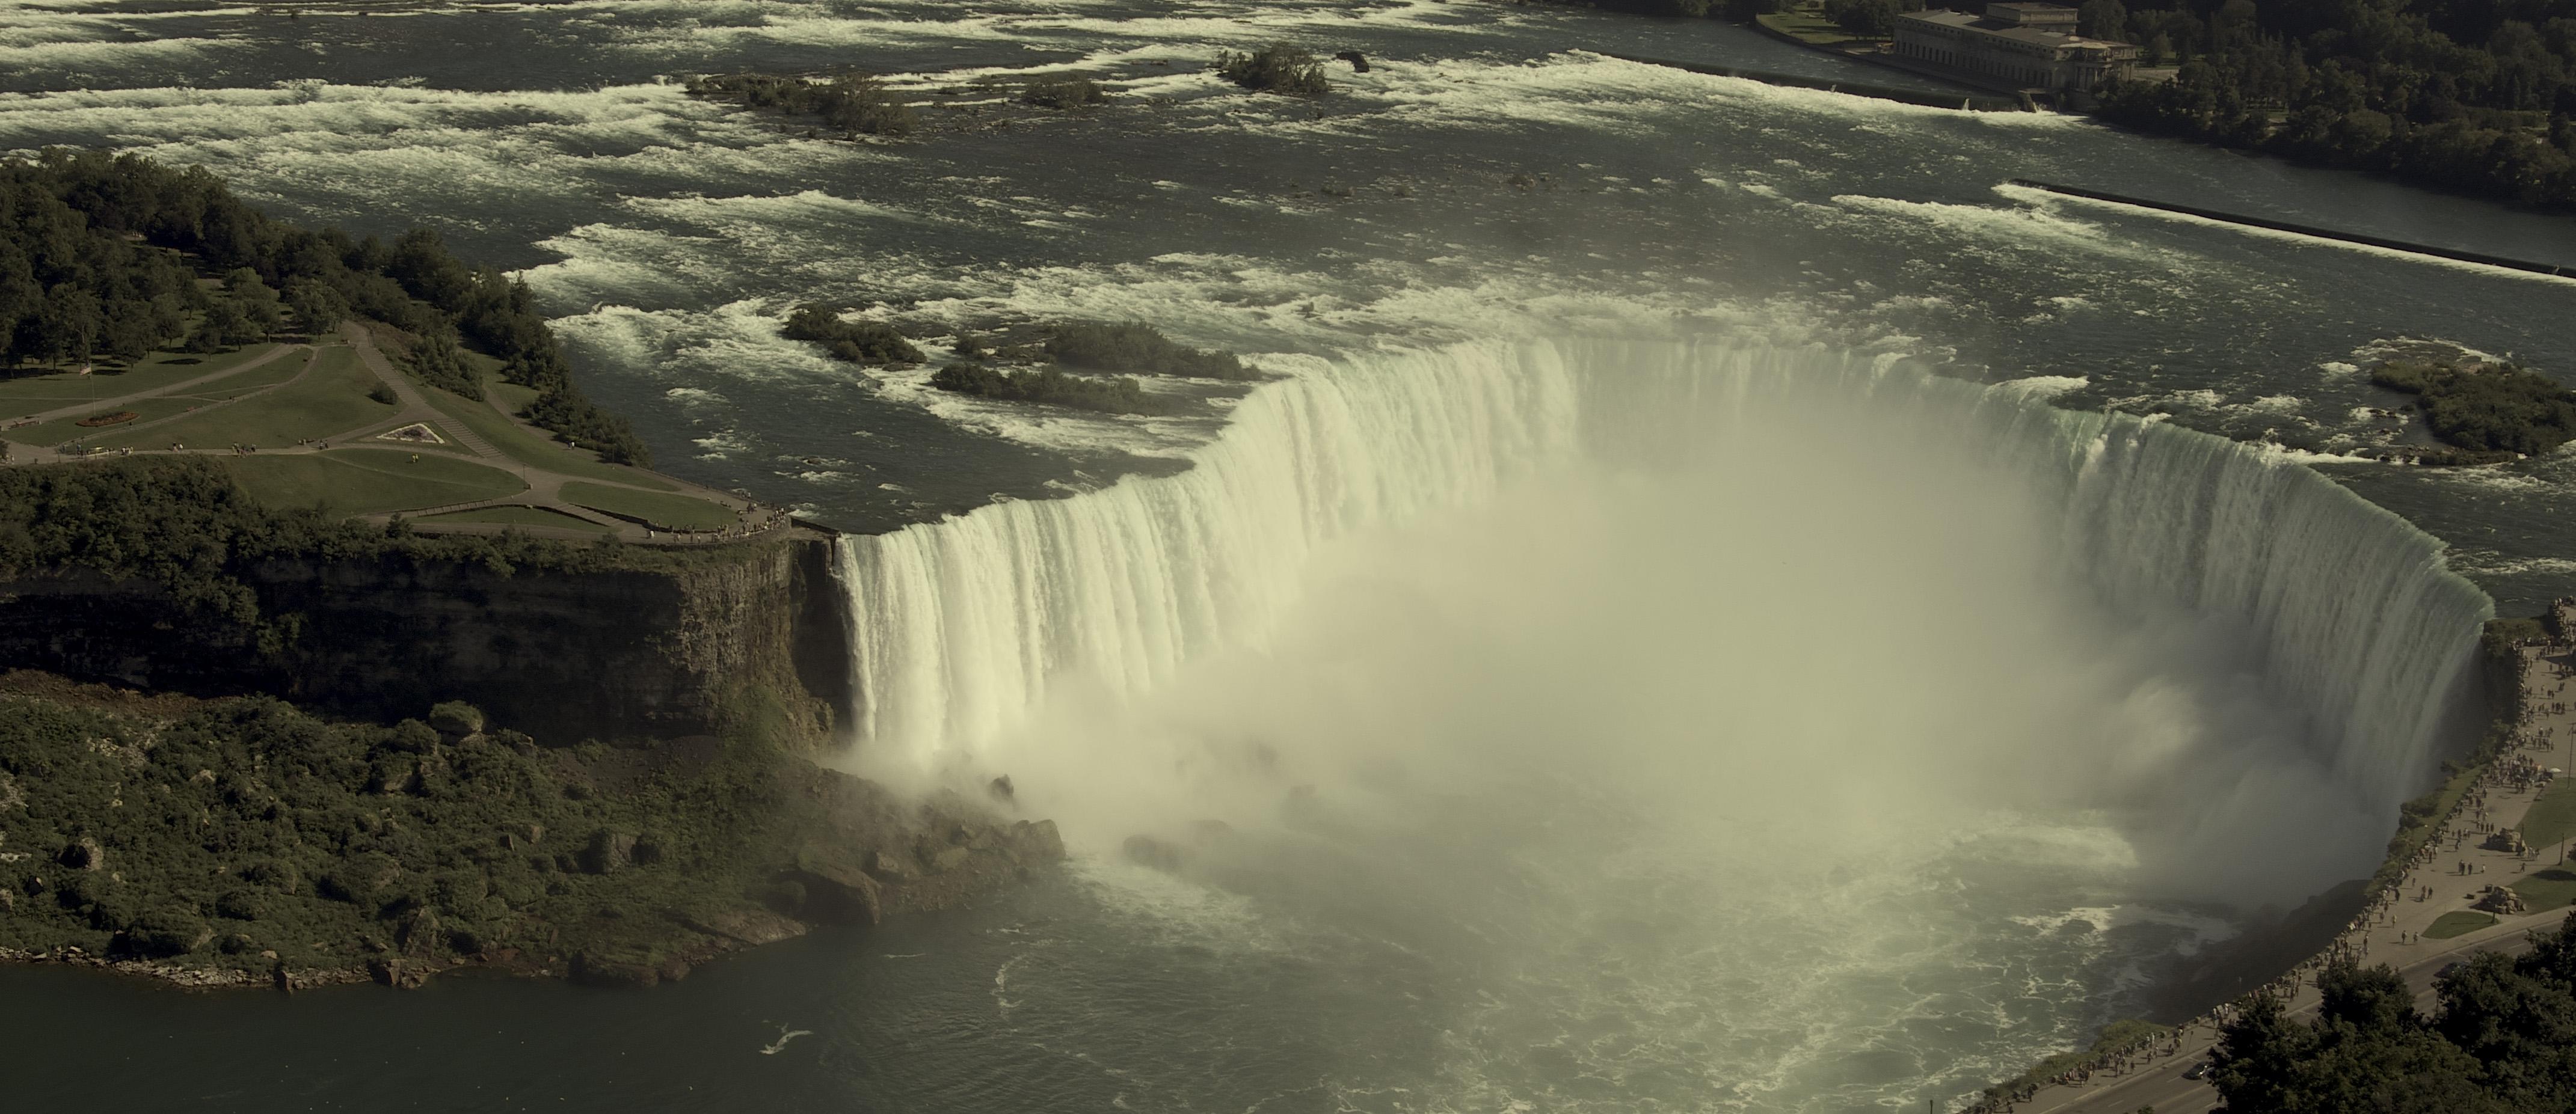 retouched+Niagara+falls+3.jpg